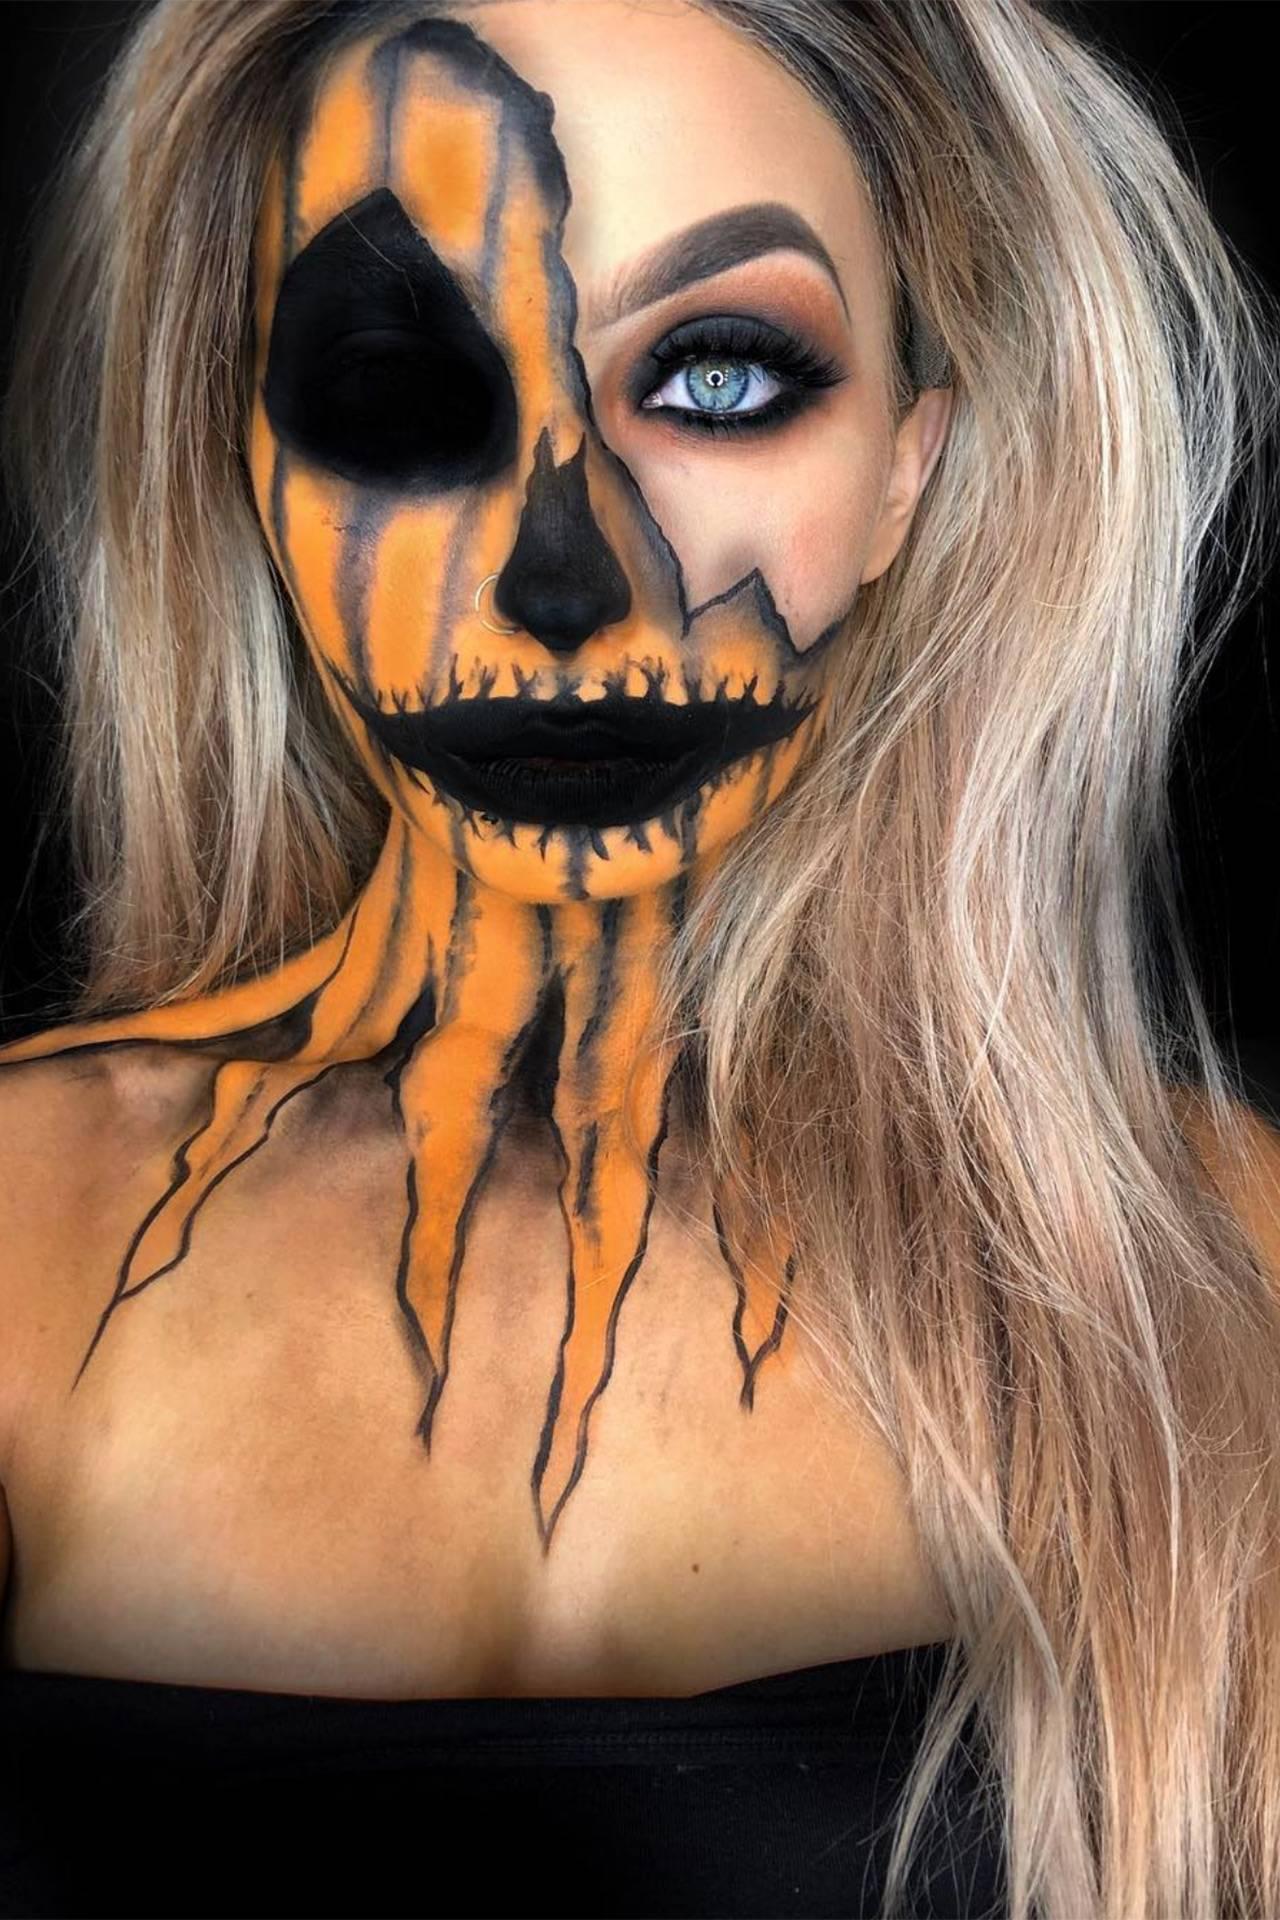 Halloween Makeup Creepy.Halloween Makeup Ideas 2020 Easy Tutorials Instagram Ideas Glamour Uk